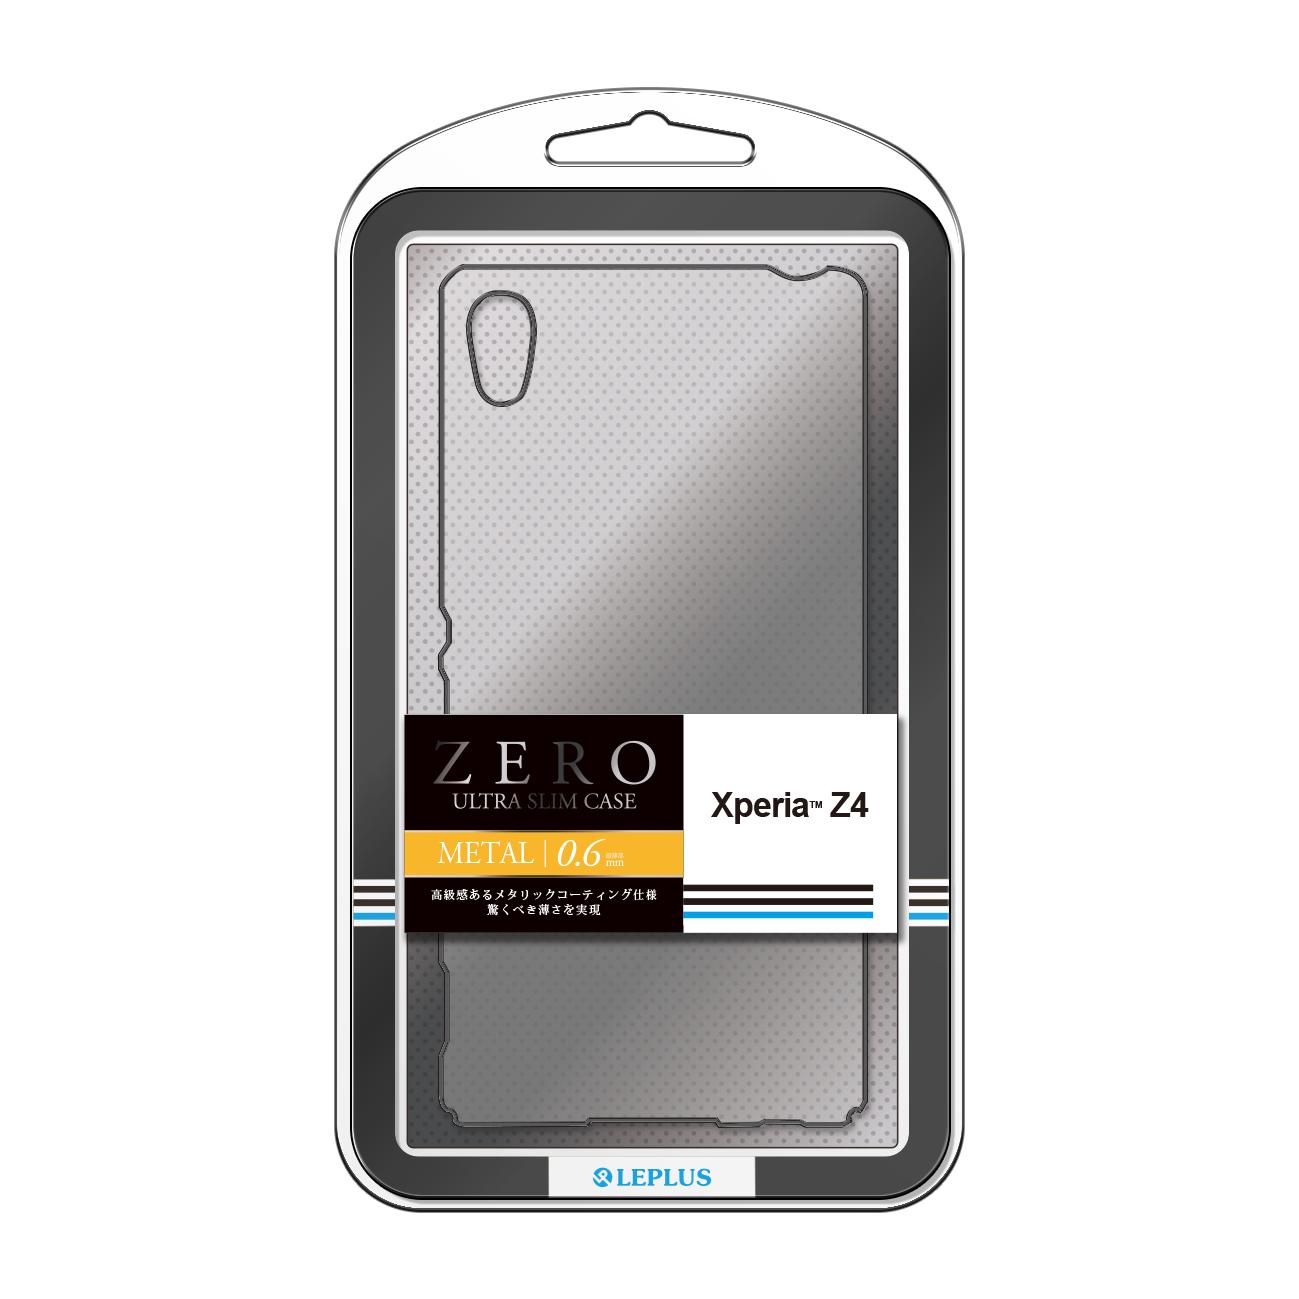 Xperia(TM) Z4 SO-03G/SOV31/402SO 超極薄ハードケース「ZERO METAL」 クリア&チタン